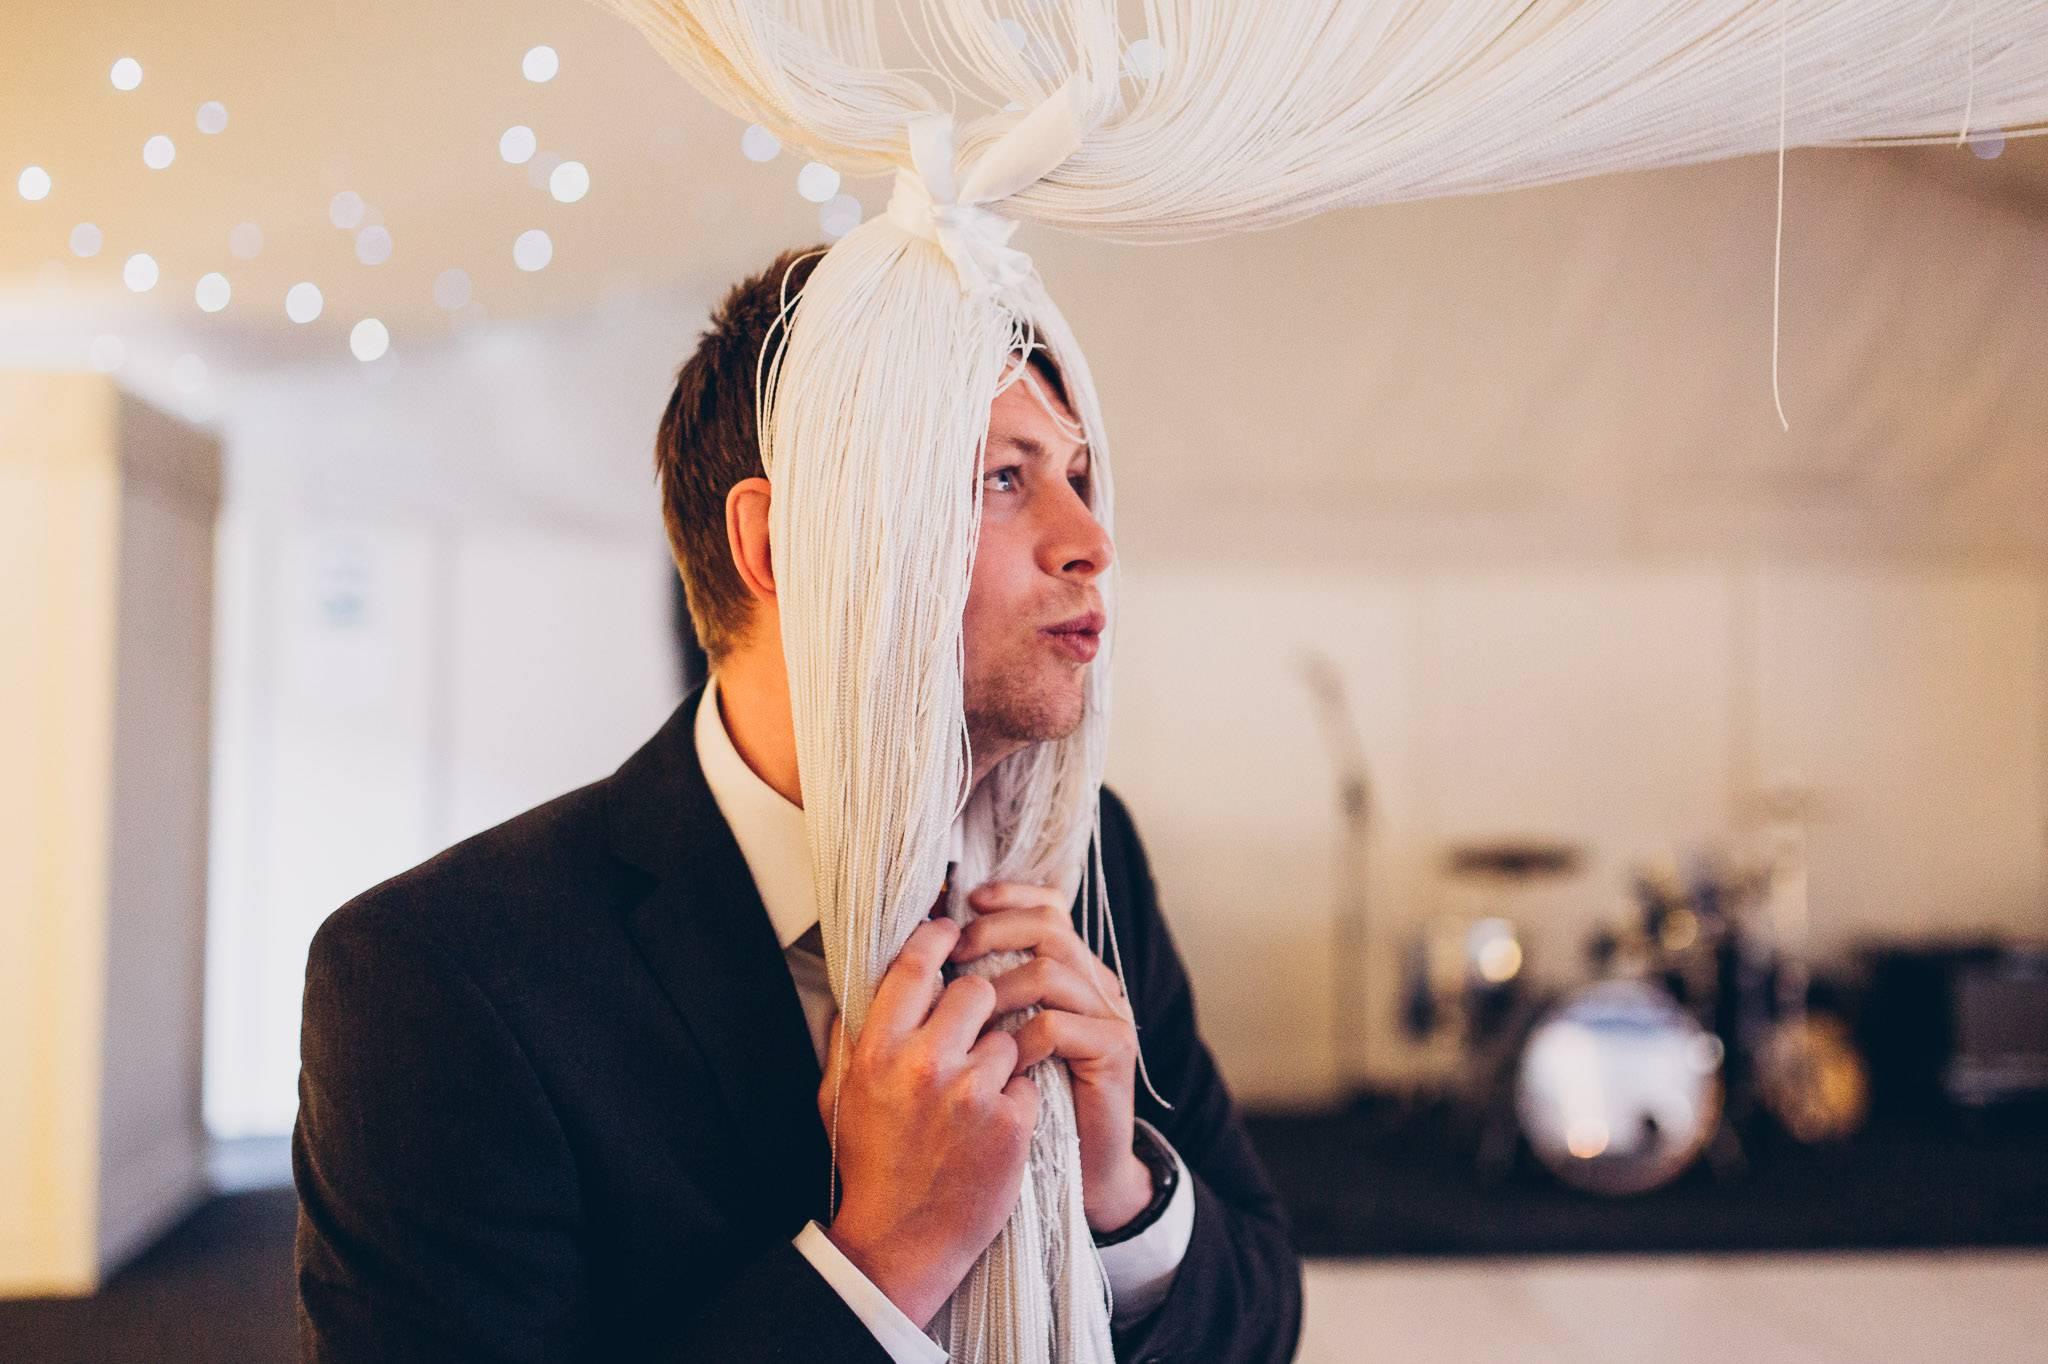 shropshire-wedding-photography 34.jpg